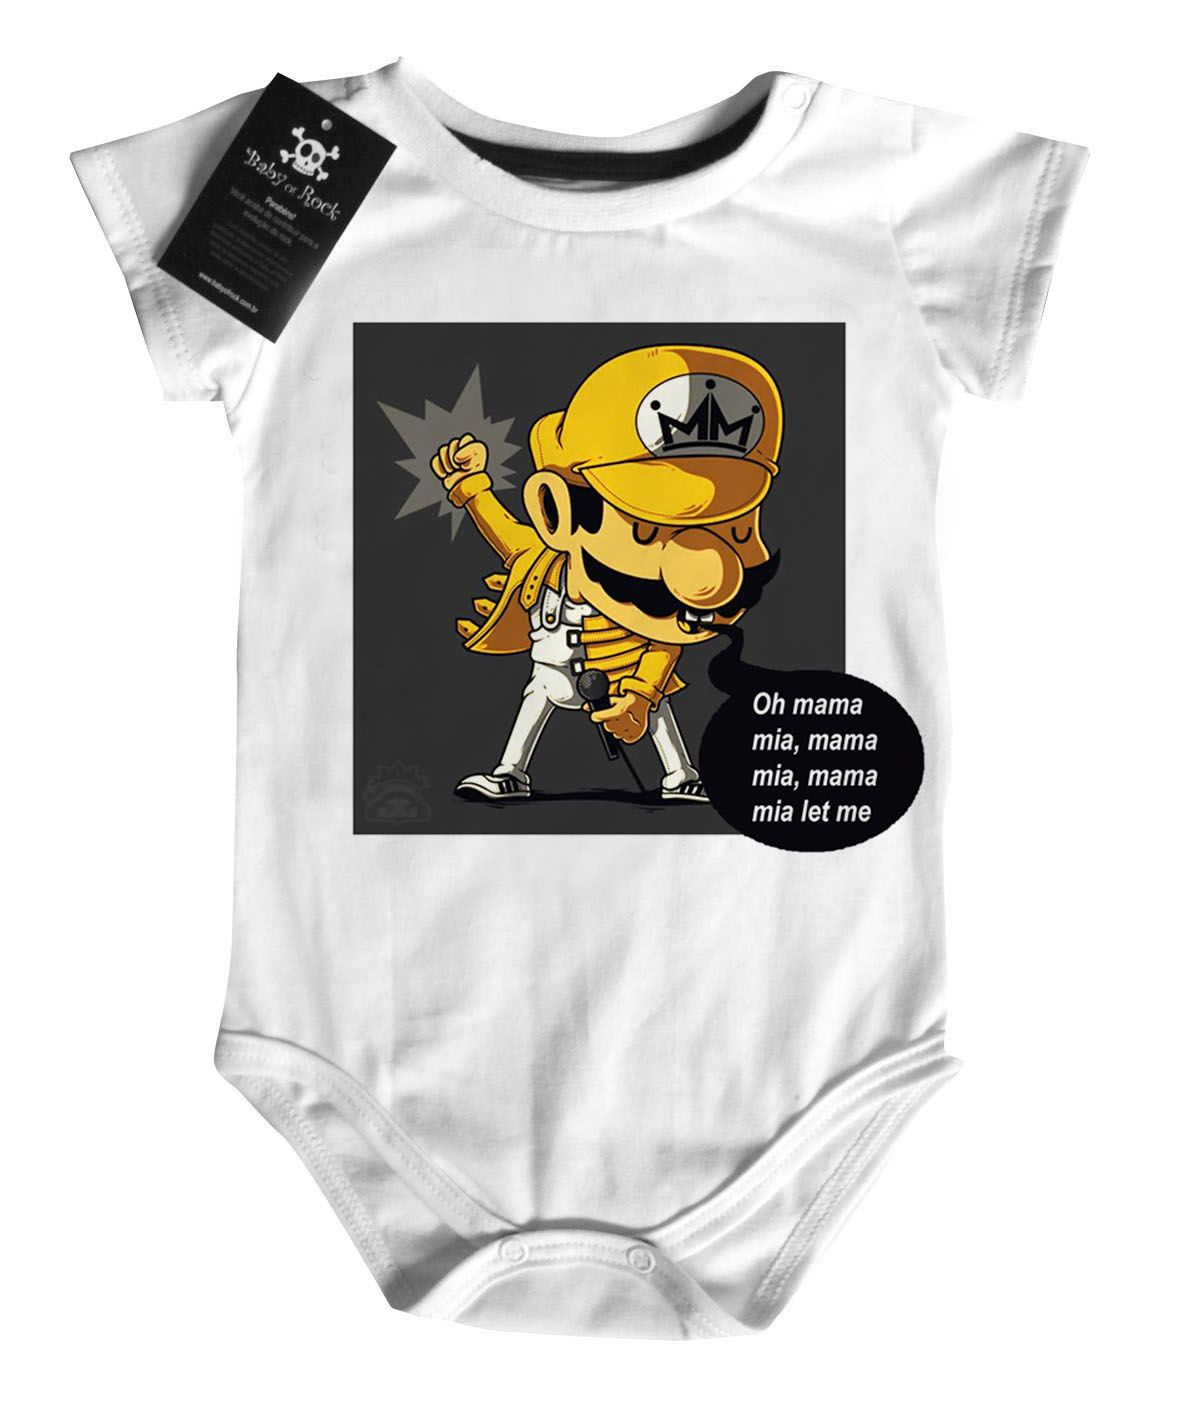 Body Rock Baby Mário Freddy Mercury Queen  - Caricato - White  - Baby Monster S/A